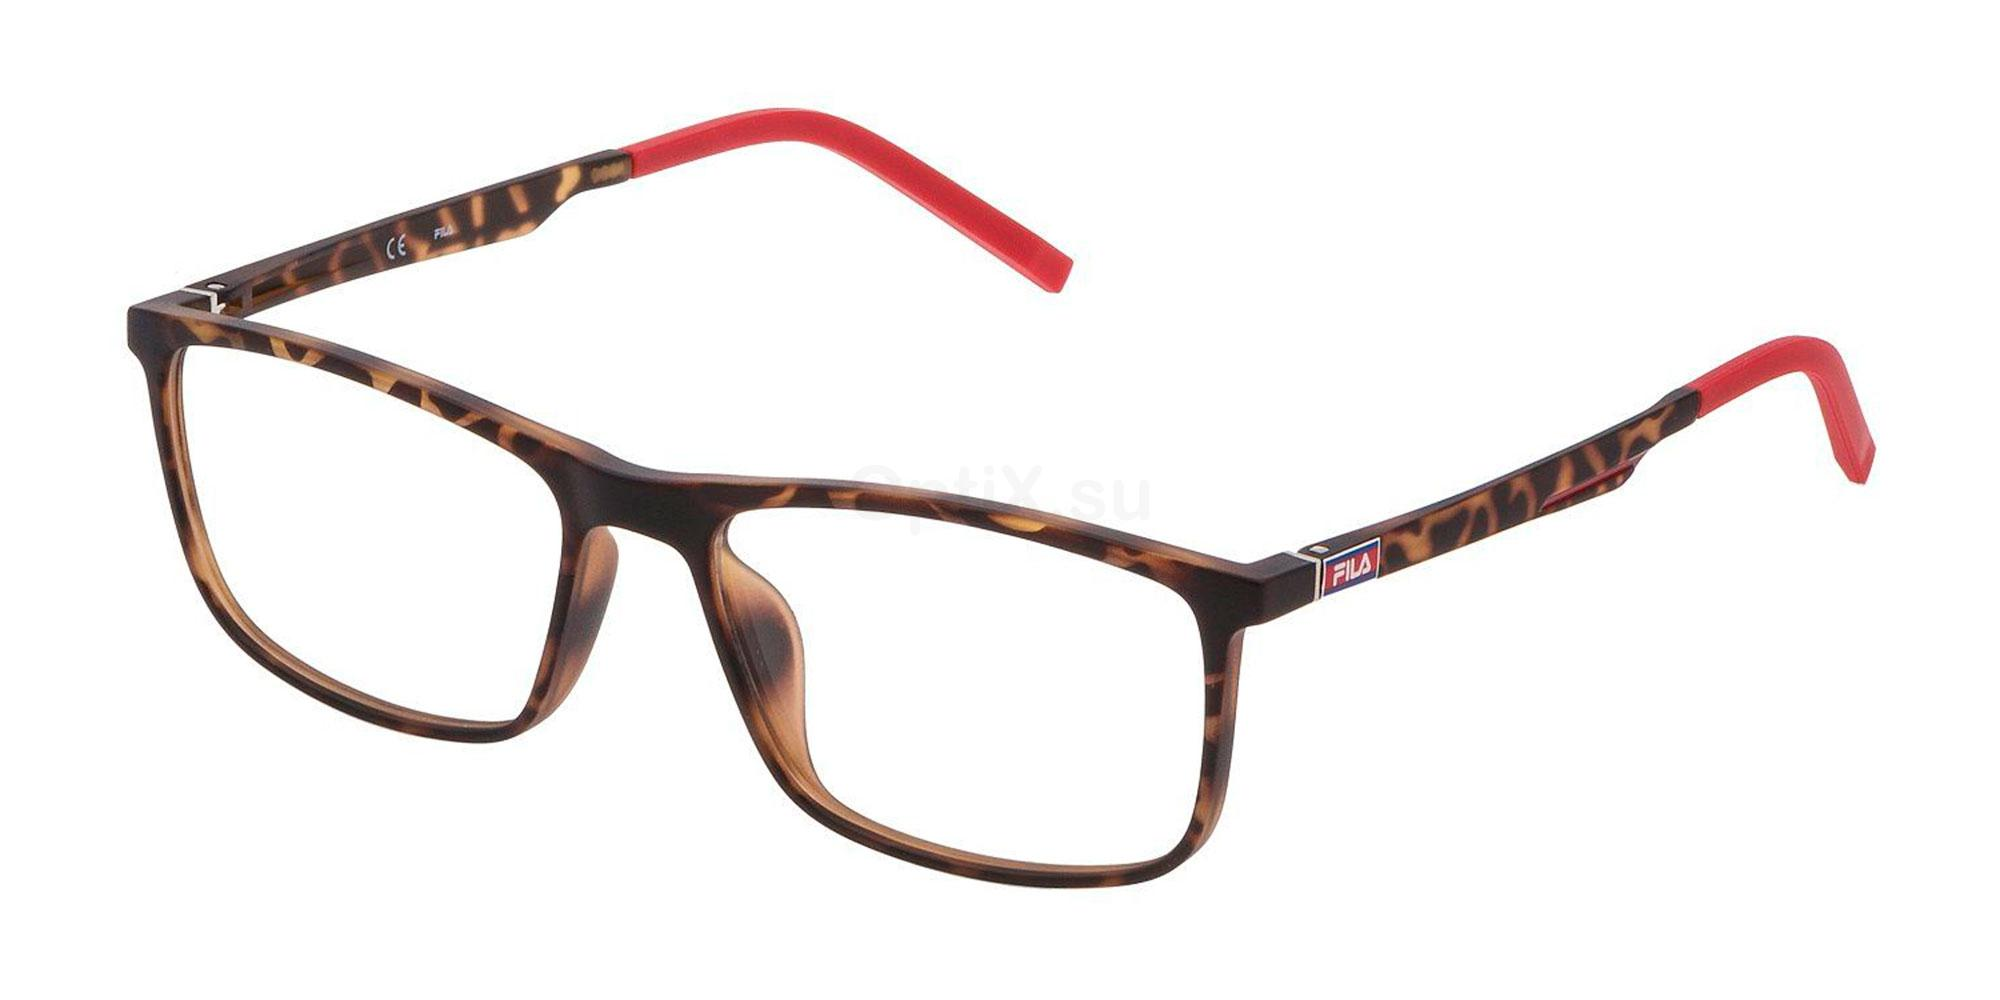 0878 VF9191 Glasses, Fila